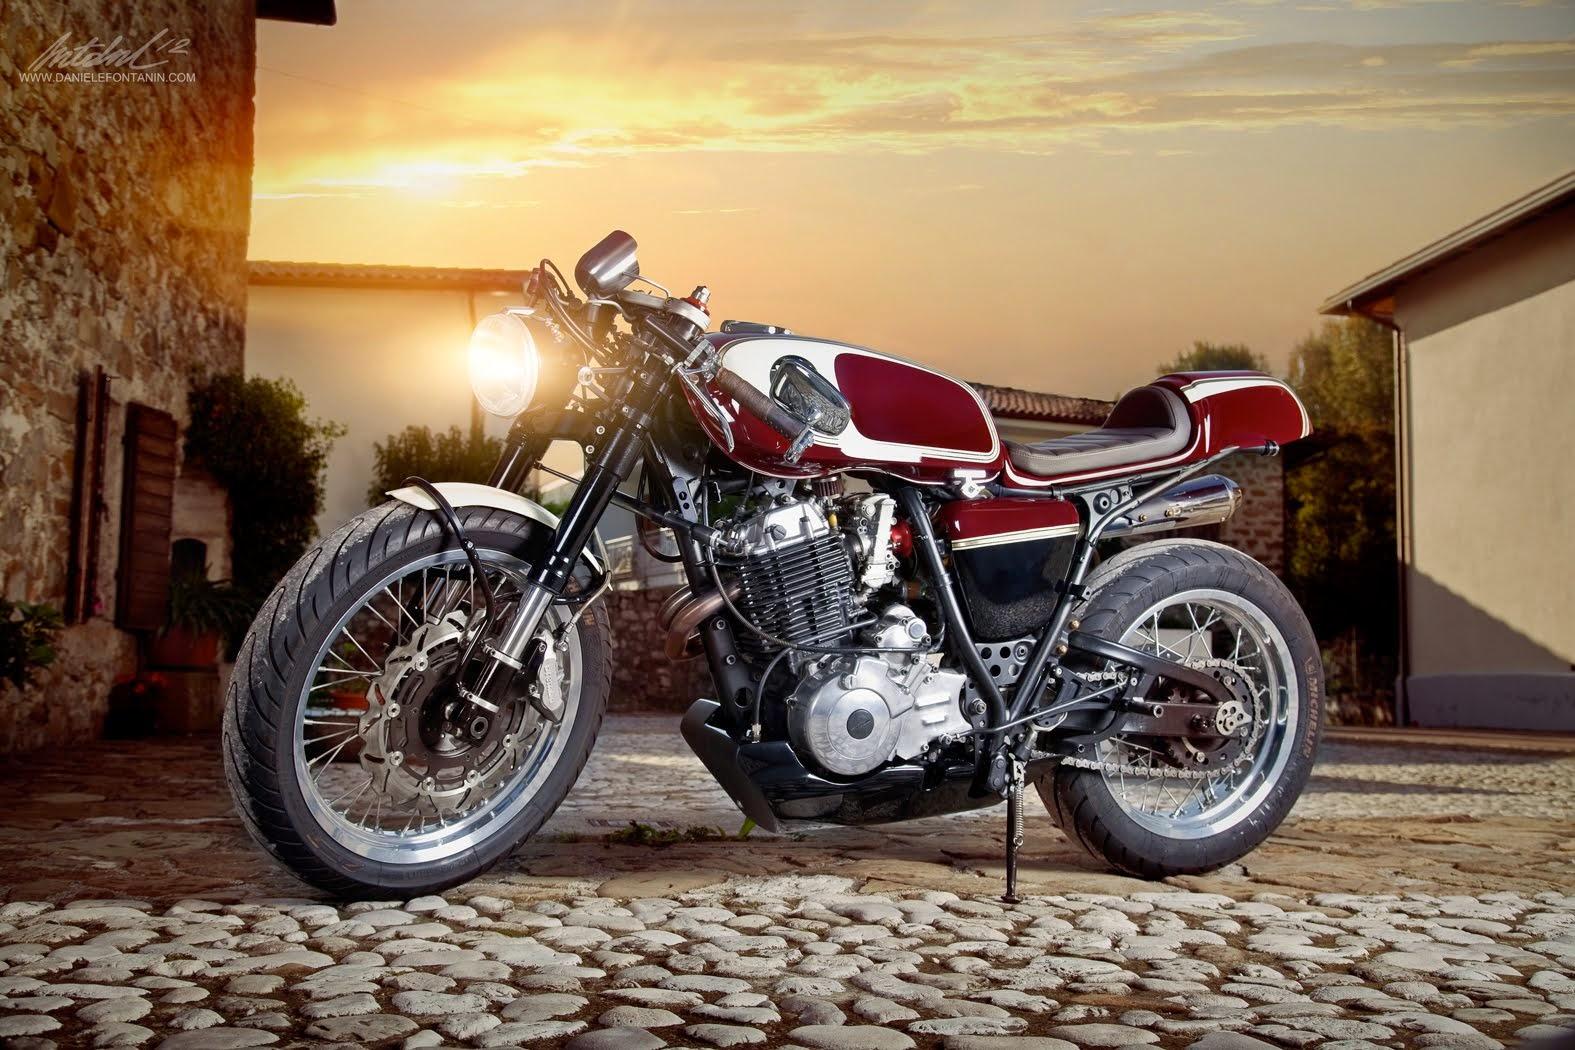 Proto moto by planb motorcycles rocketgarage cafe for Moto regalasi